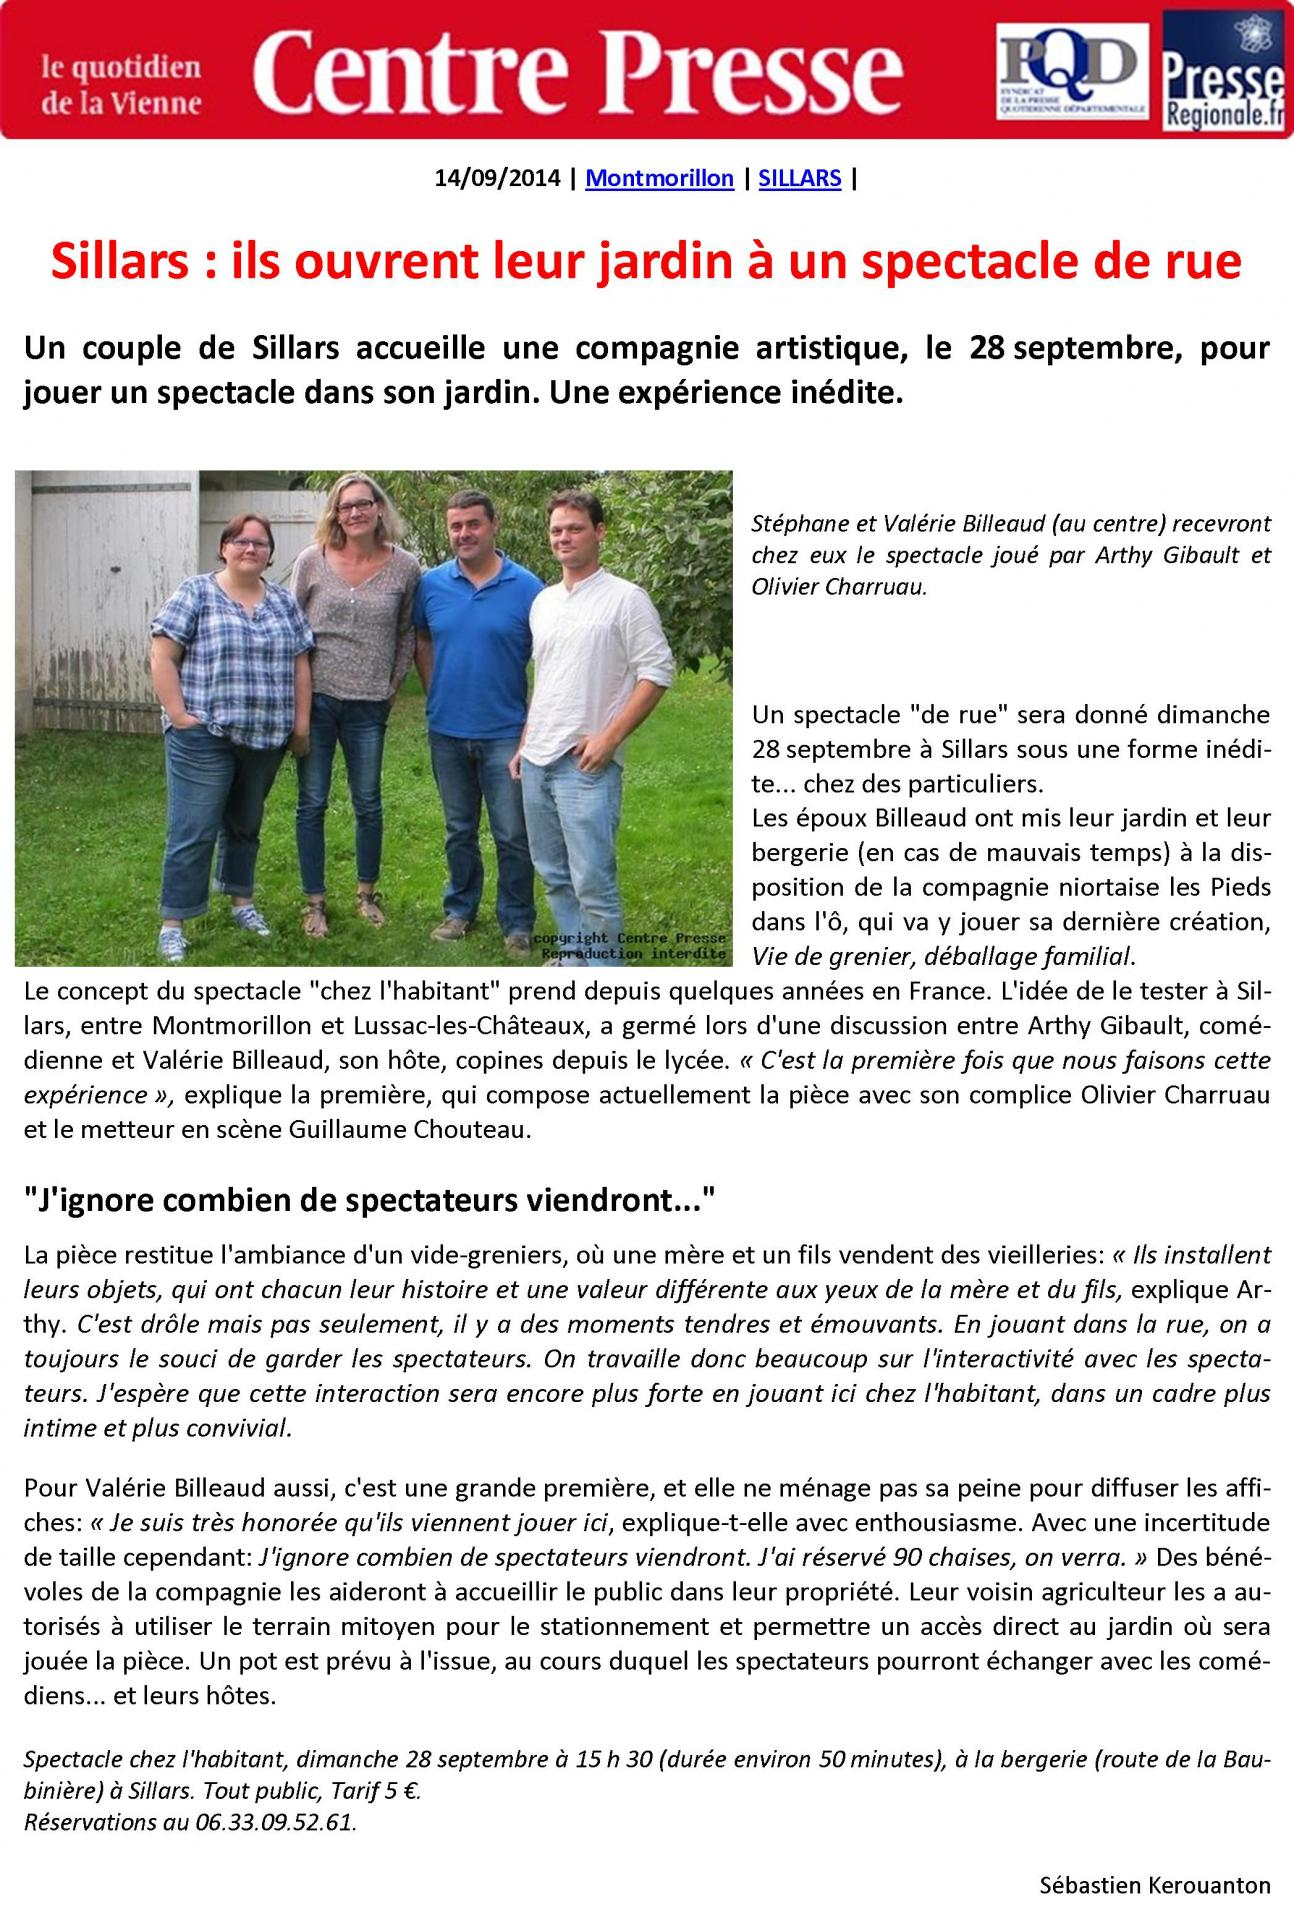 2014-09-14 - Vie de Grenier - Centre Presse